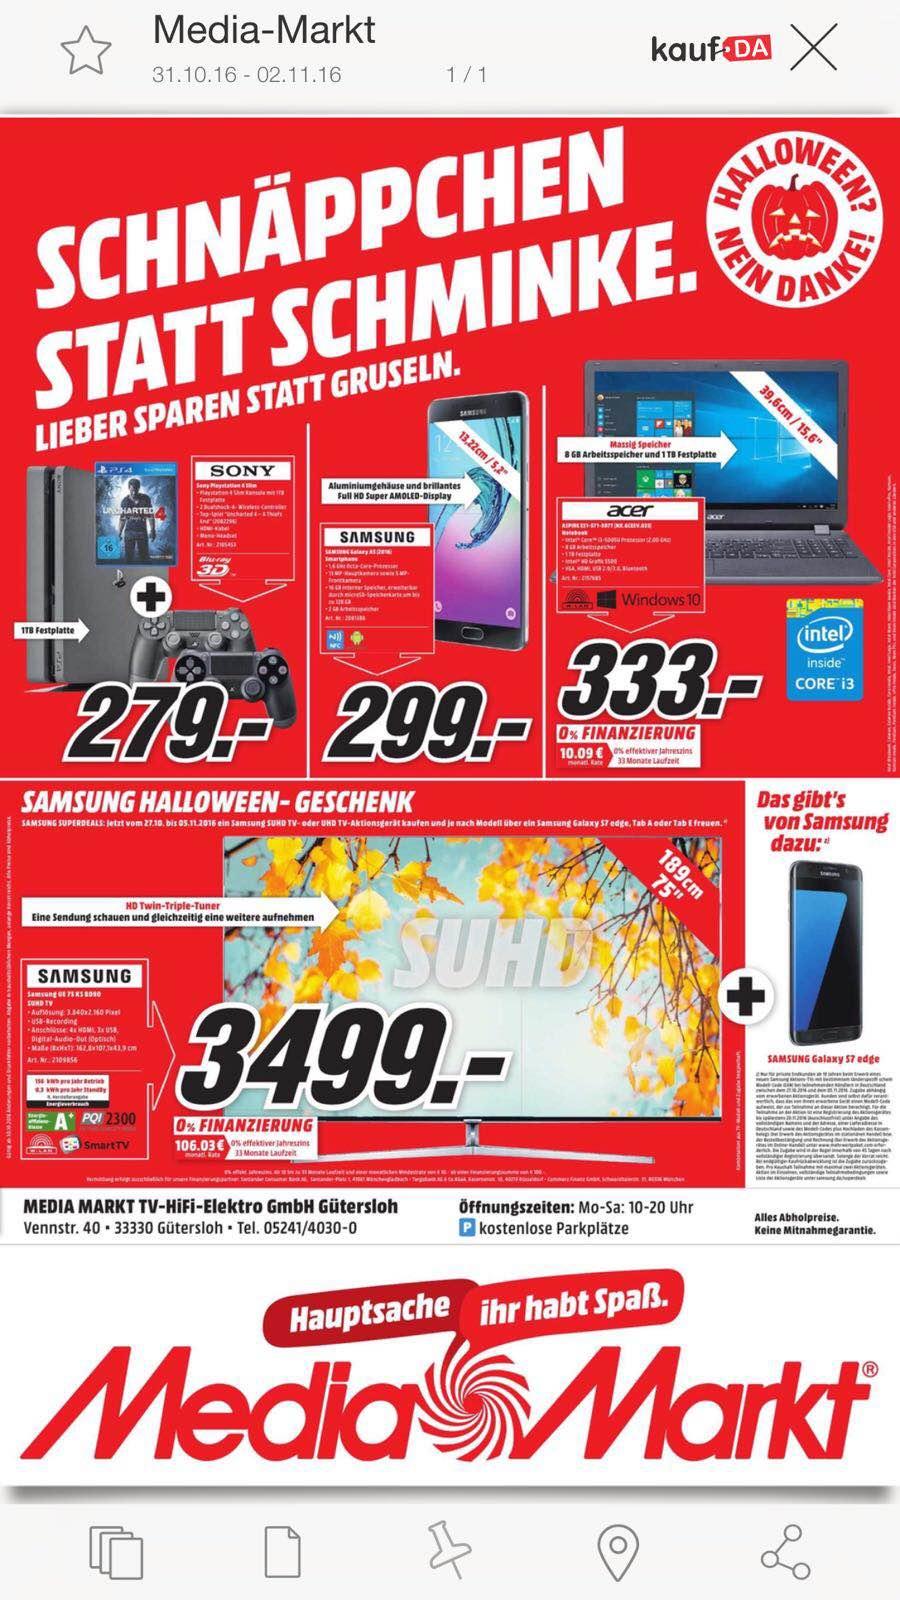 (Lokal) Media Markt Gütersloh Playstation 4 Slim 1 TB + 2. Controller + Uncharted 4 für 279,- Euro